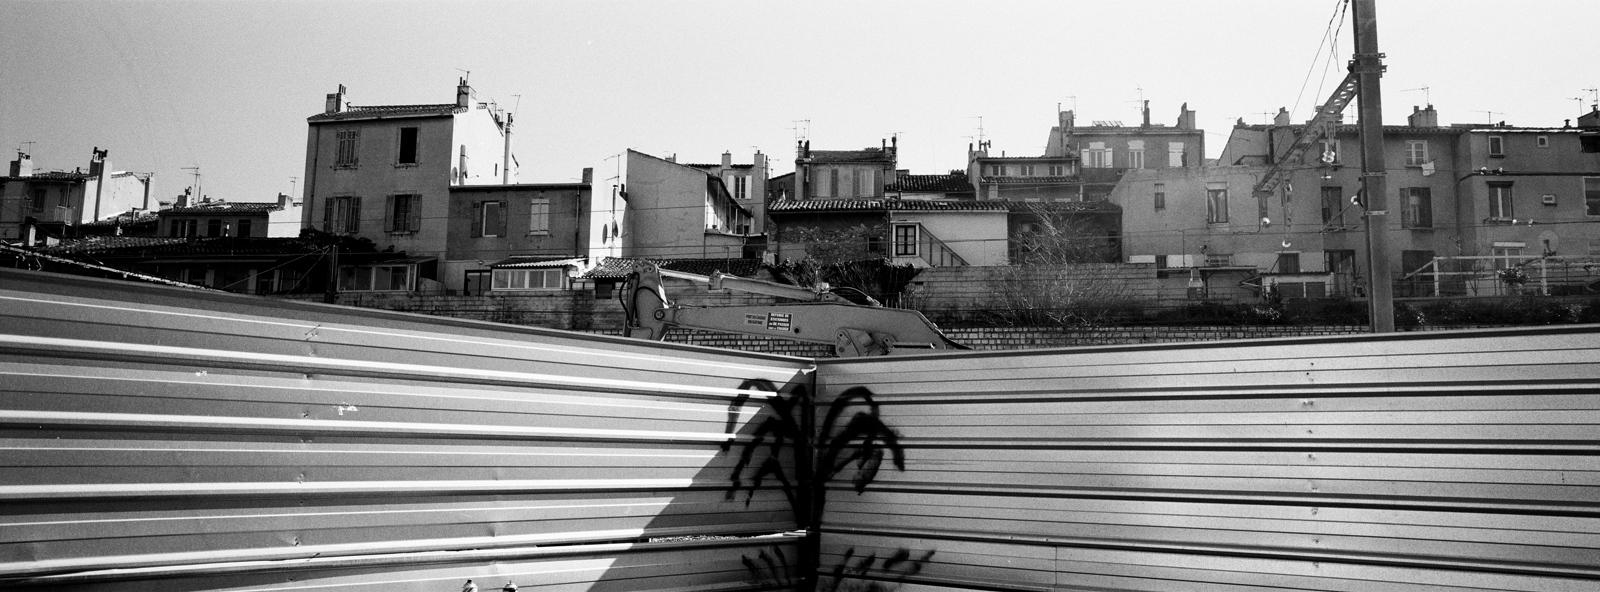 Art and Documentary Photography - Loading 044_Marseille___Fabio_Sgroi.jpg